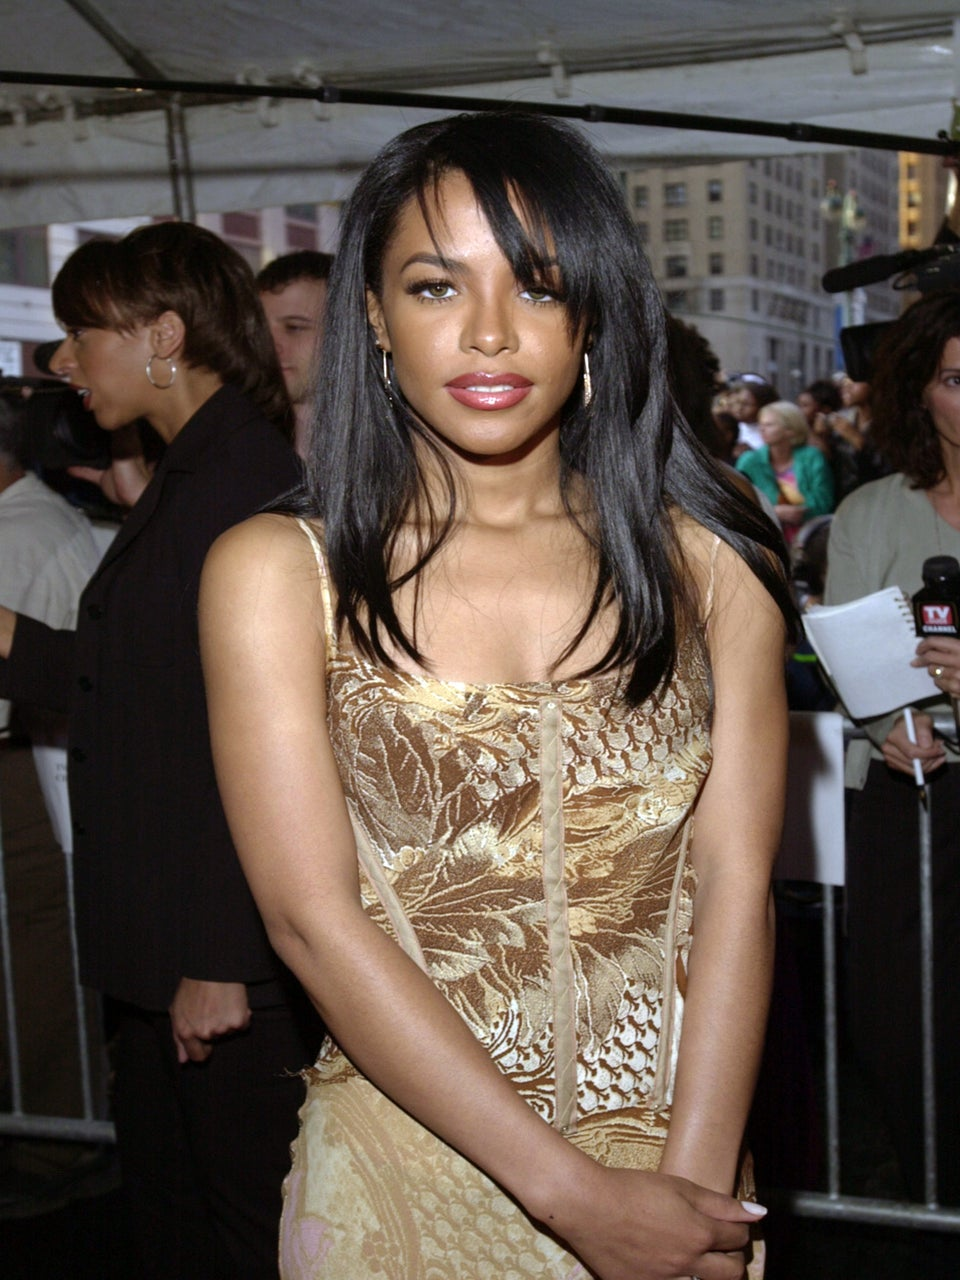 Timbaland Releases Unheard Aaliyah Song, 'Shakin'